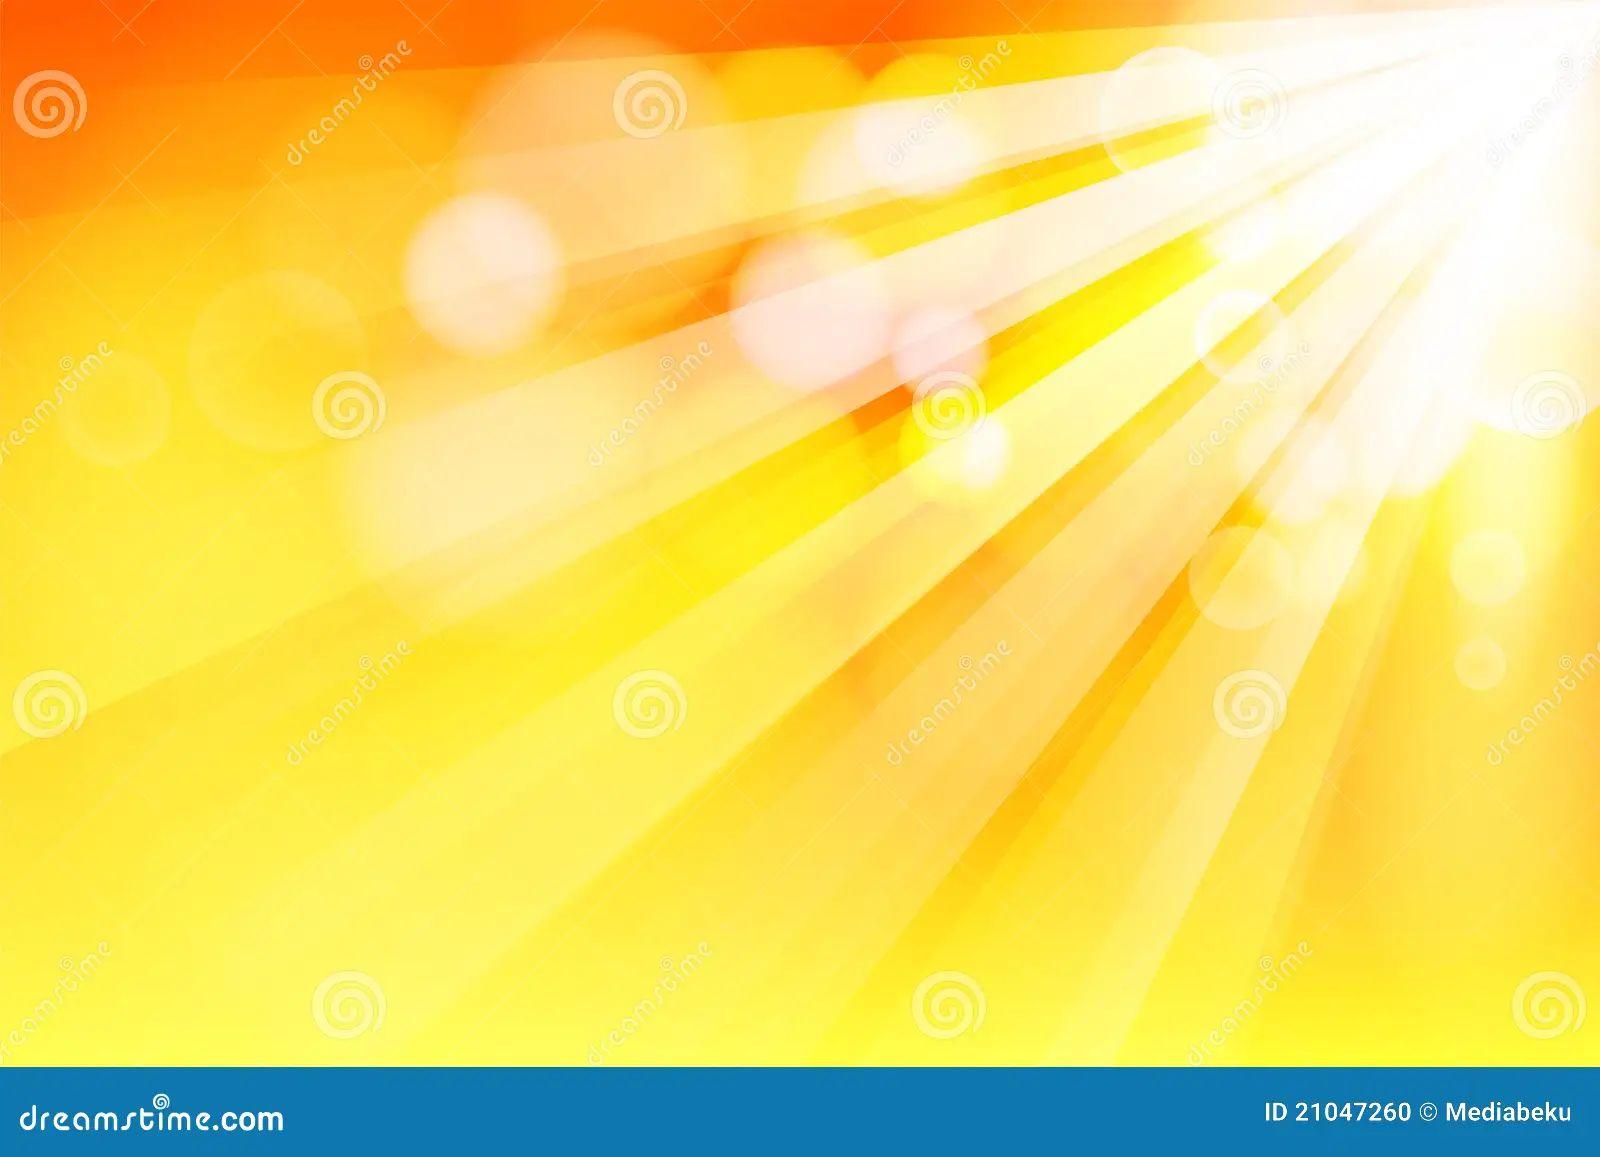 sun ray stock vector illustration of bright effect